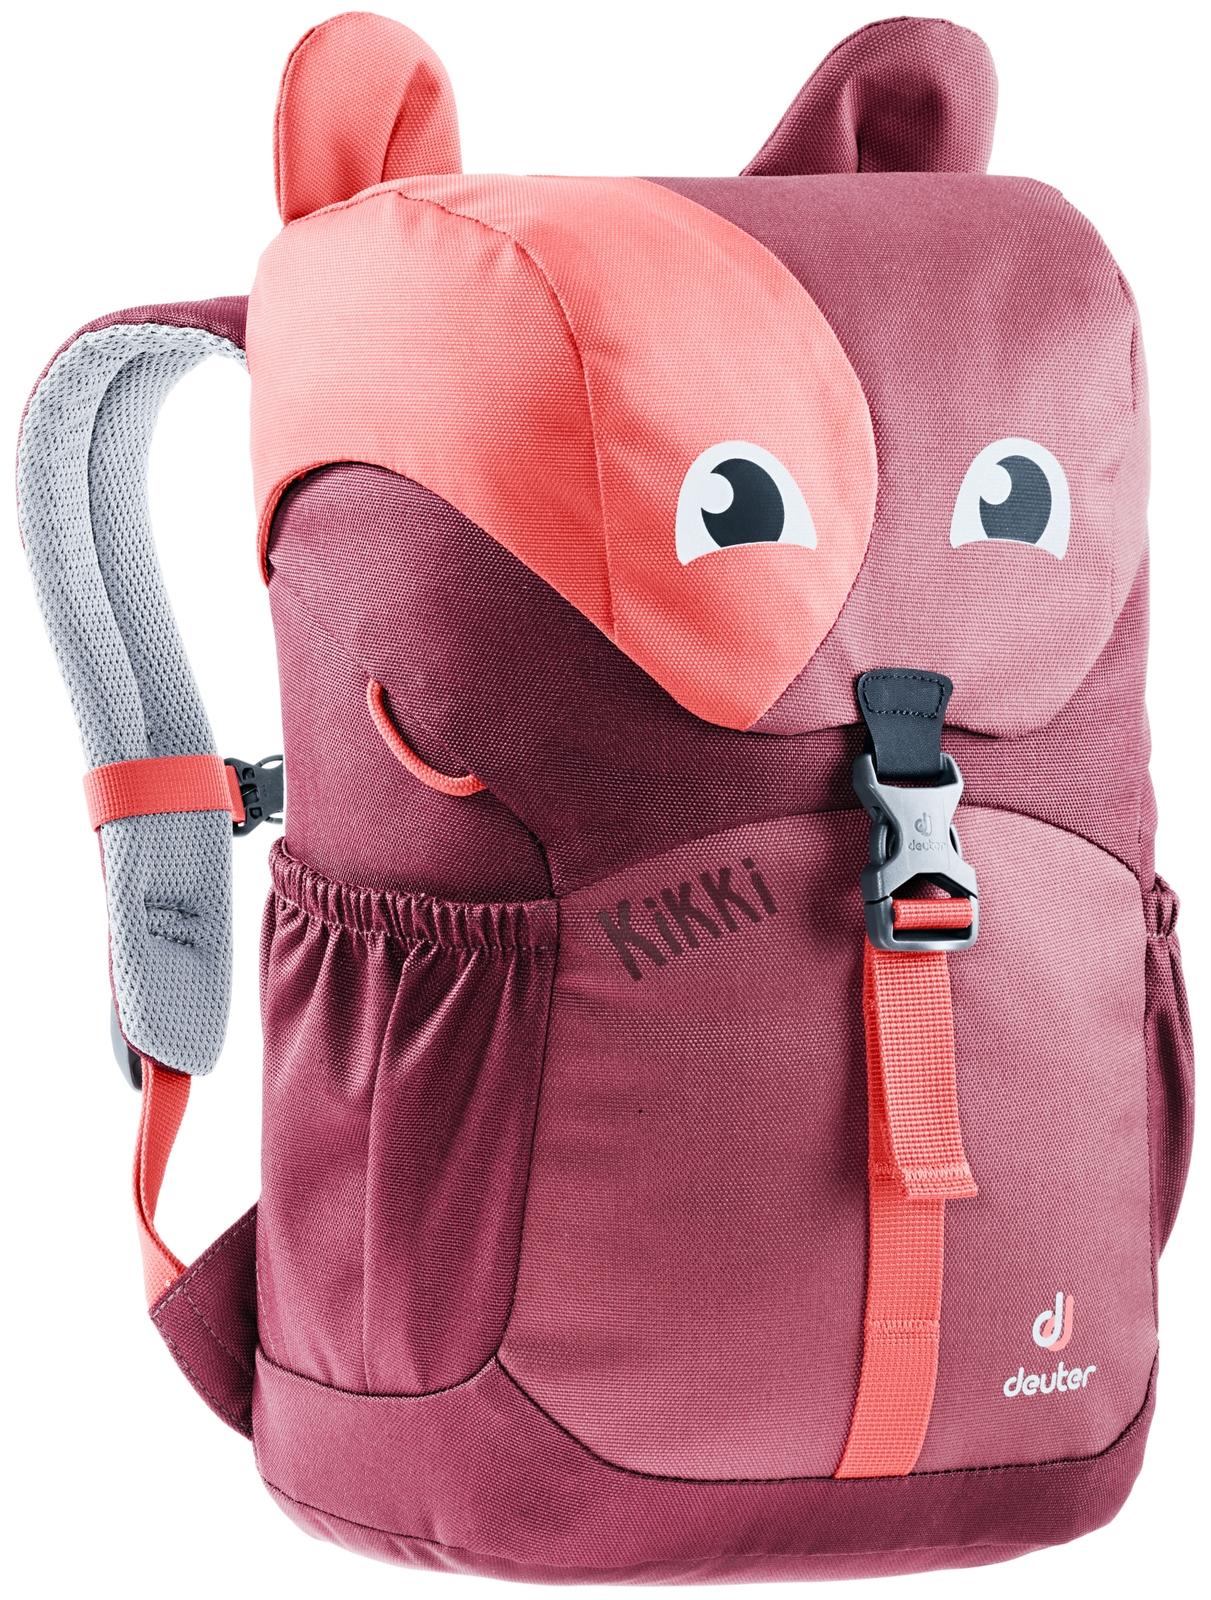 Рюкзак Deuter Kikki, цвет: красный. 3610519_5527 deuter kikki